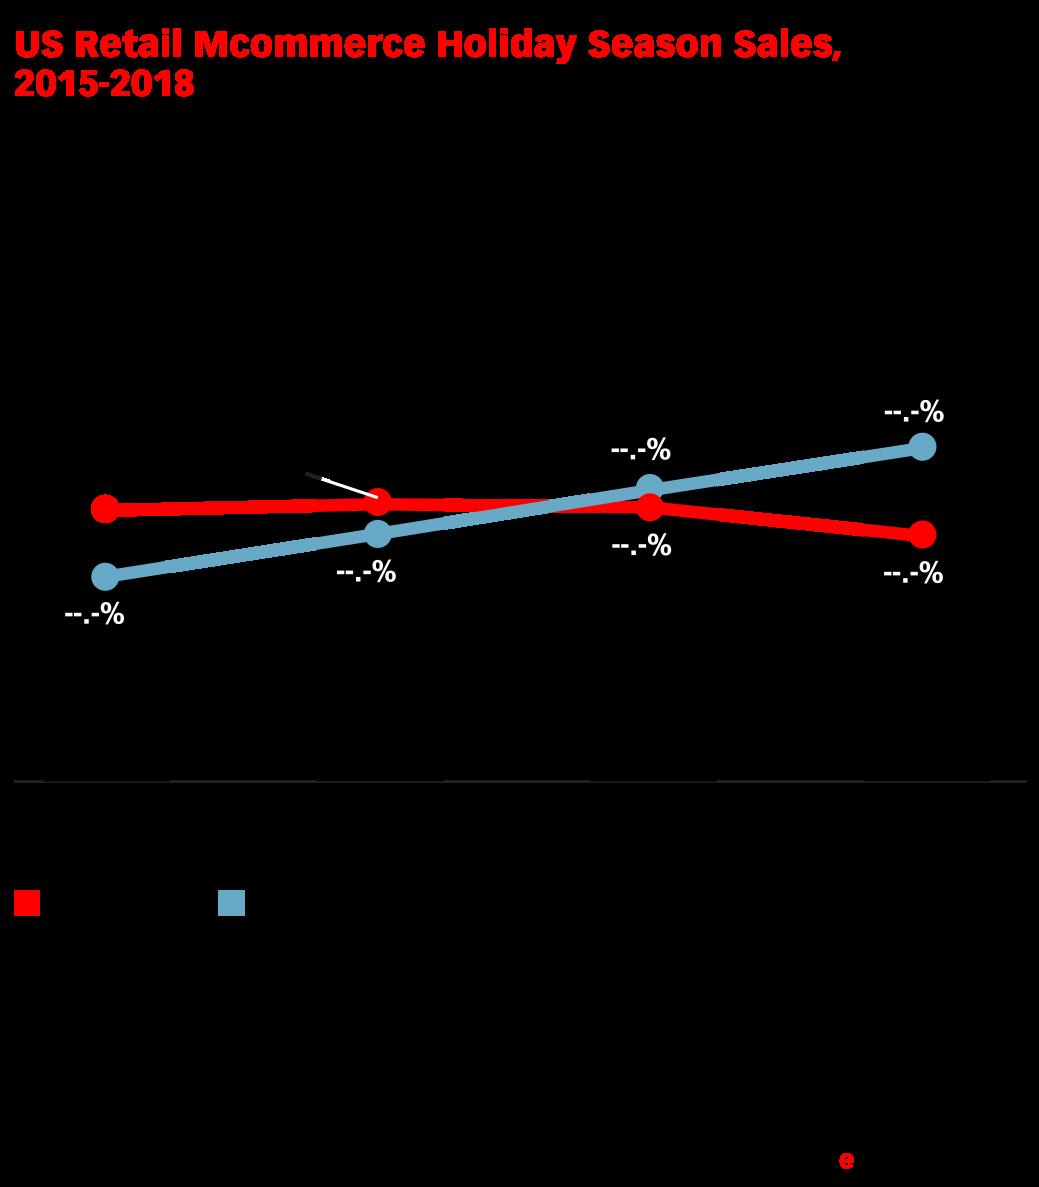 US Retail Mcommerce Holiday Season Sales, 2015-2018 (billions, % change and % of total retail ecommerce holiday season sales)